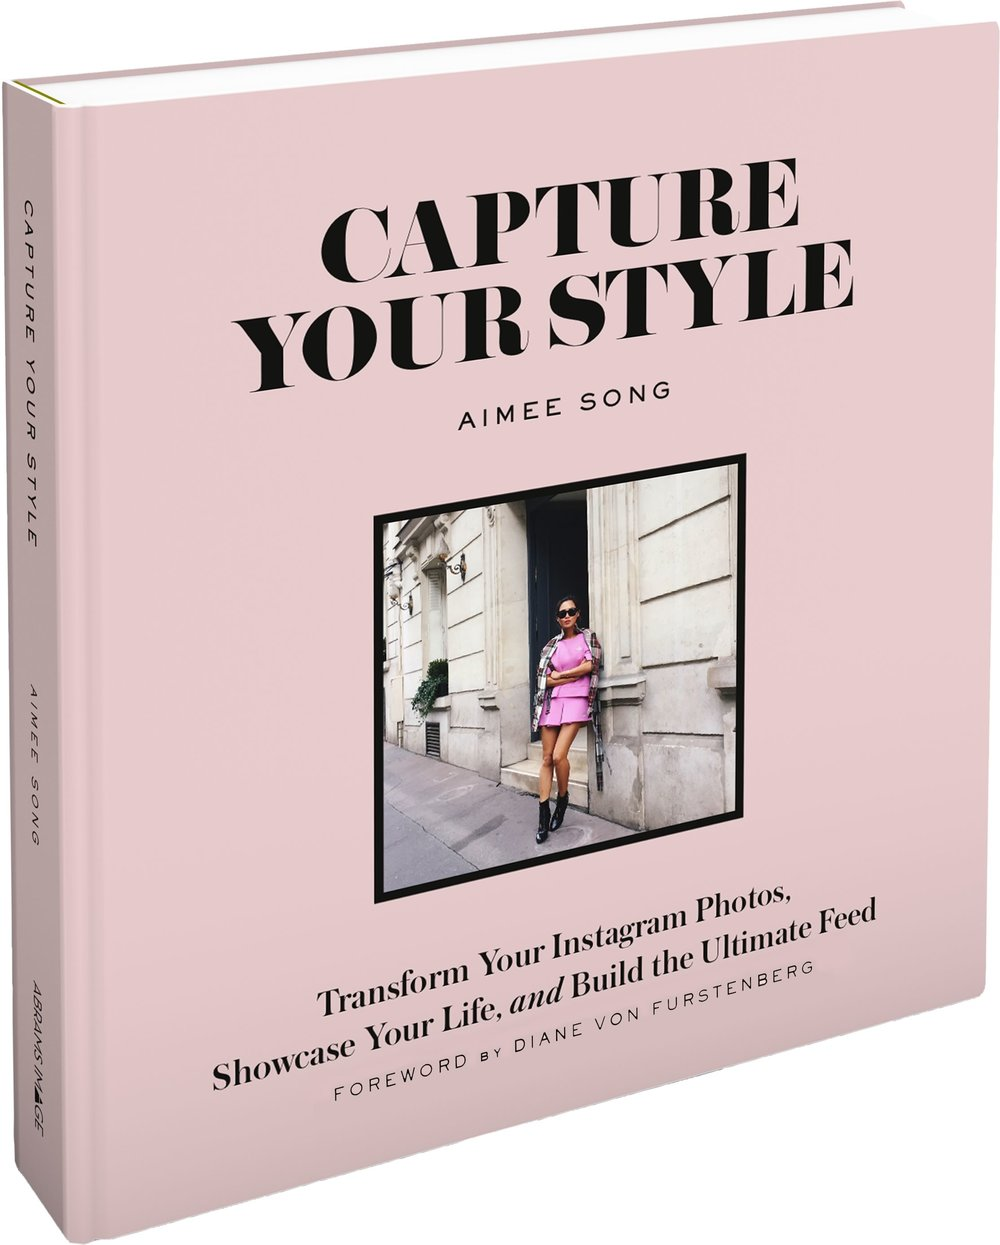 CaptureYourStyle_book.jpg